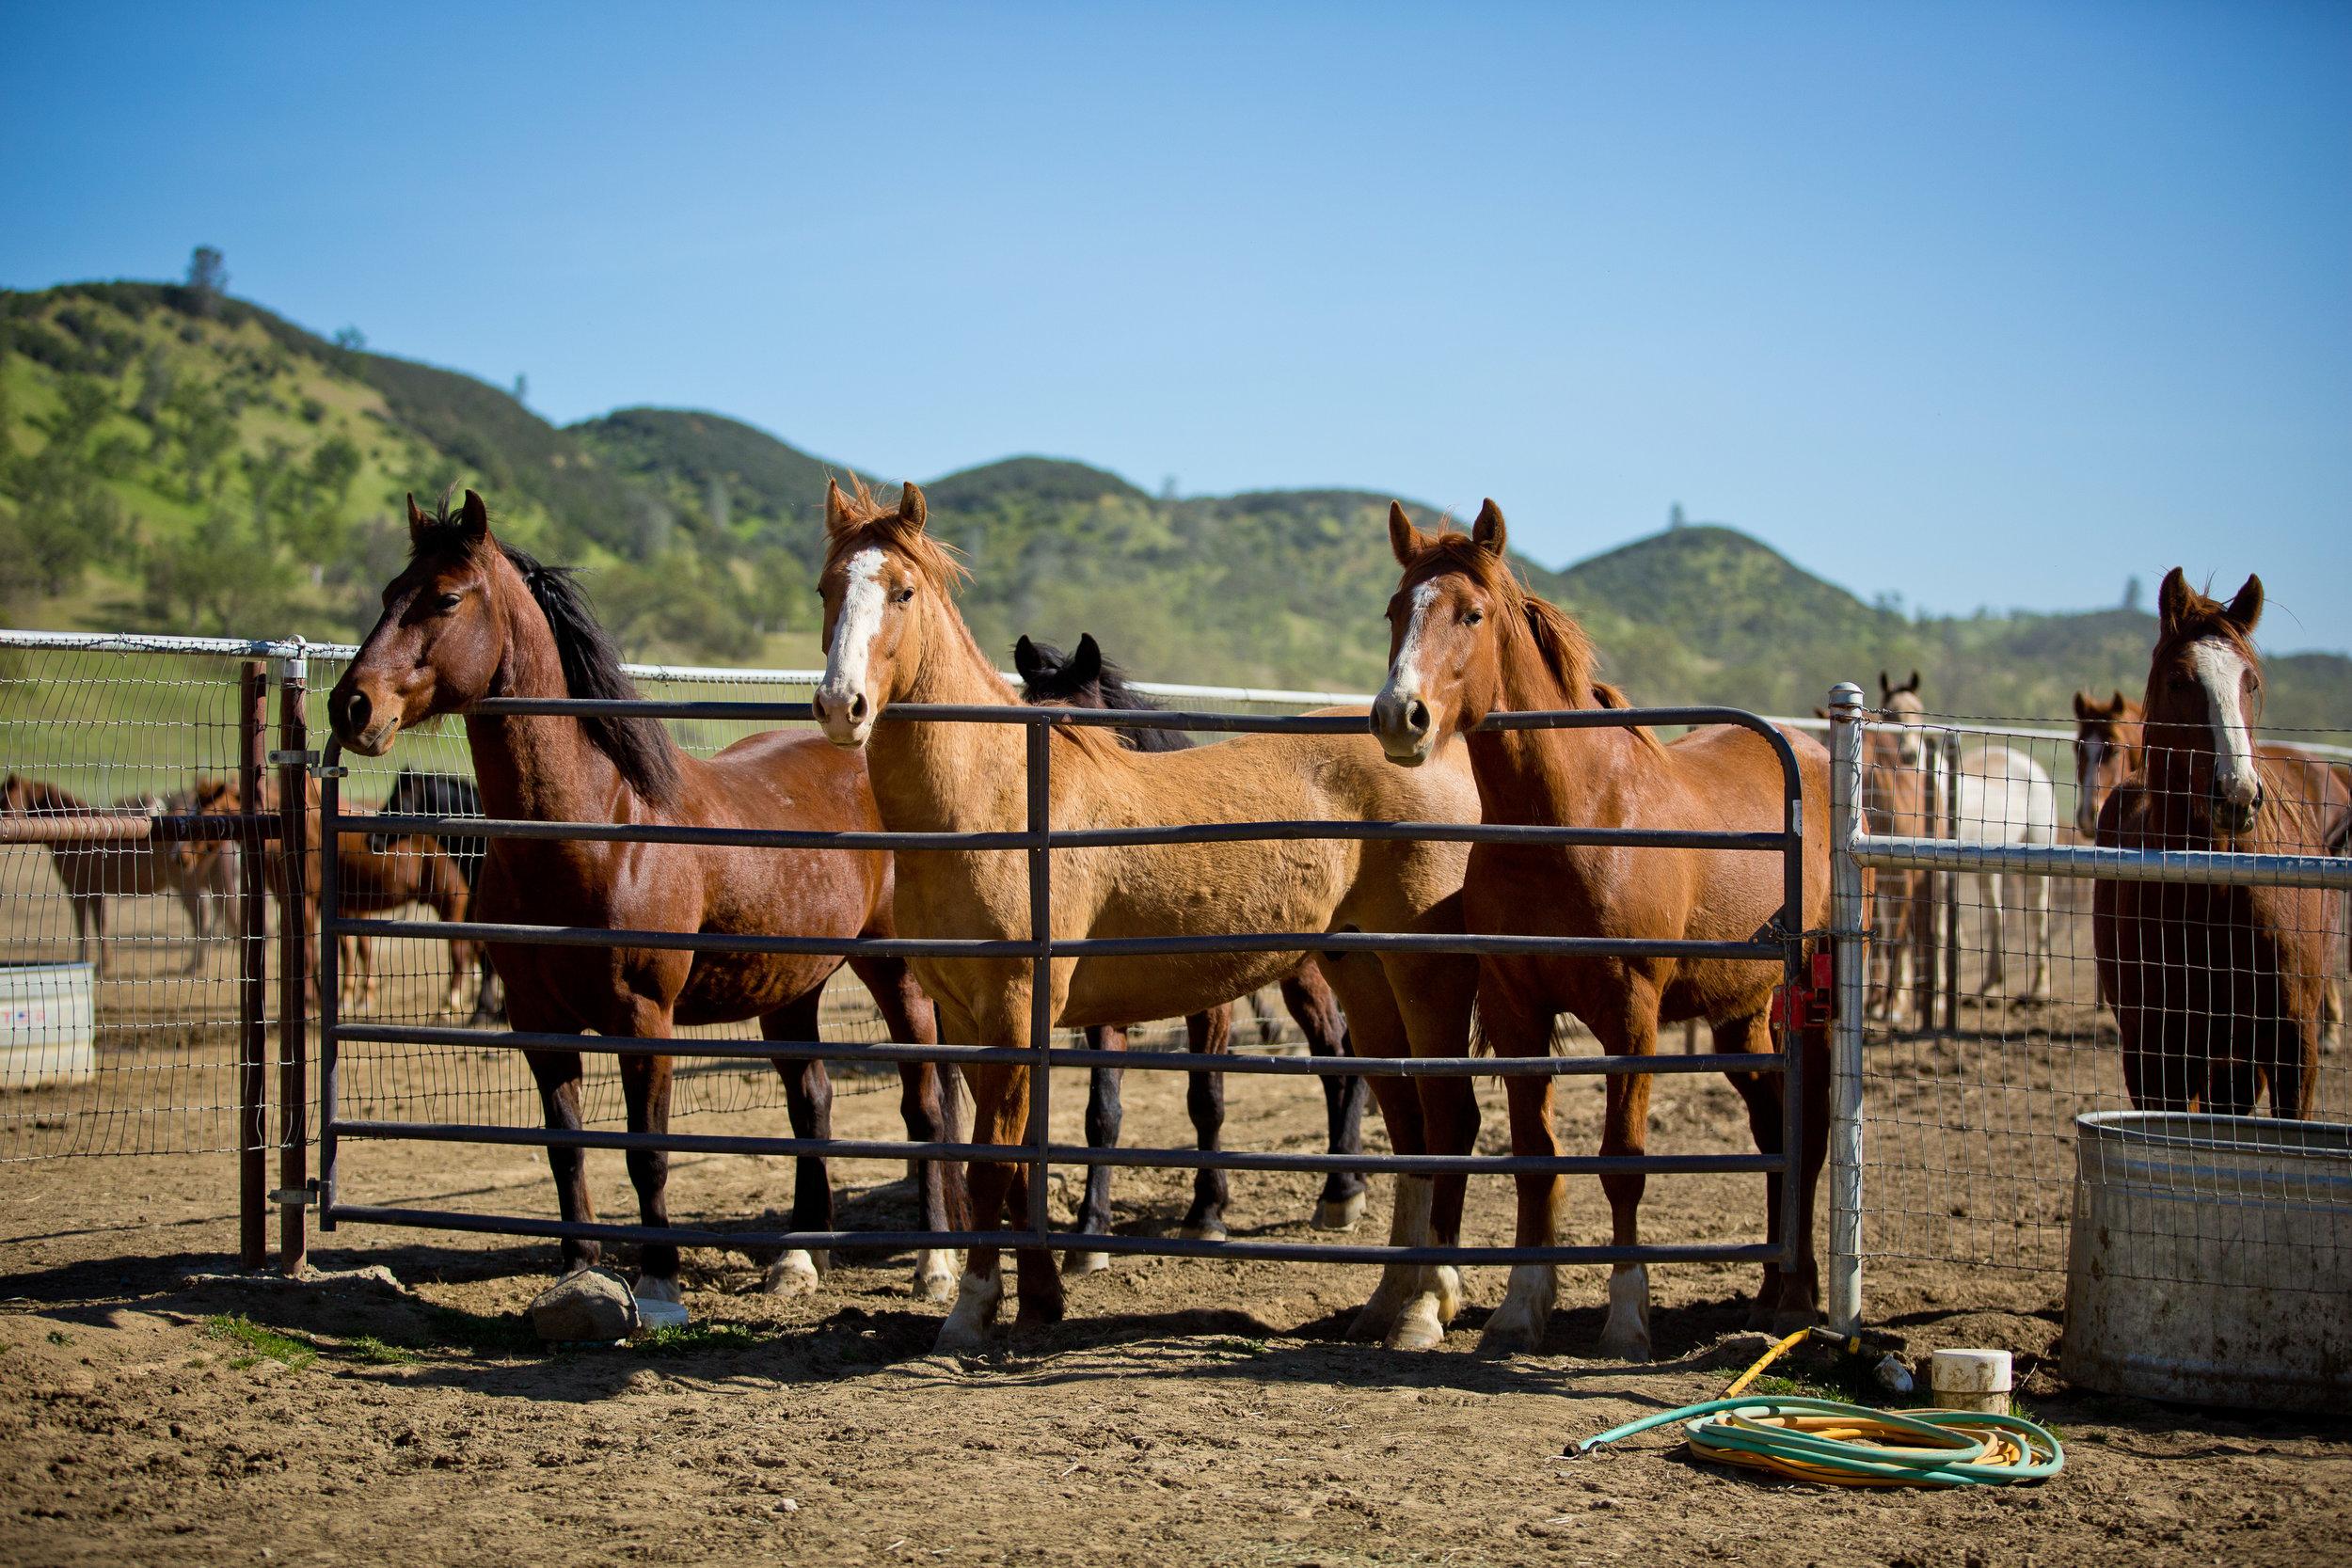 Photo of horses awaiting the chute, by Tara Arrowood